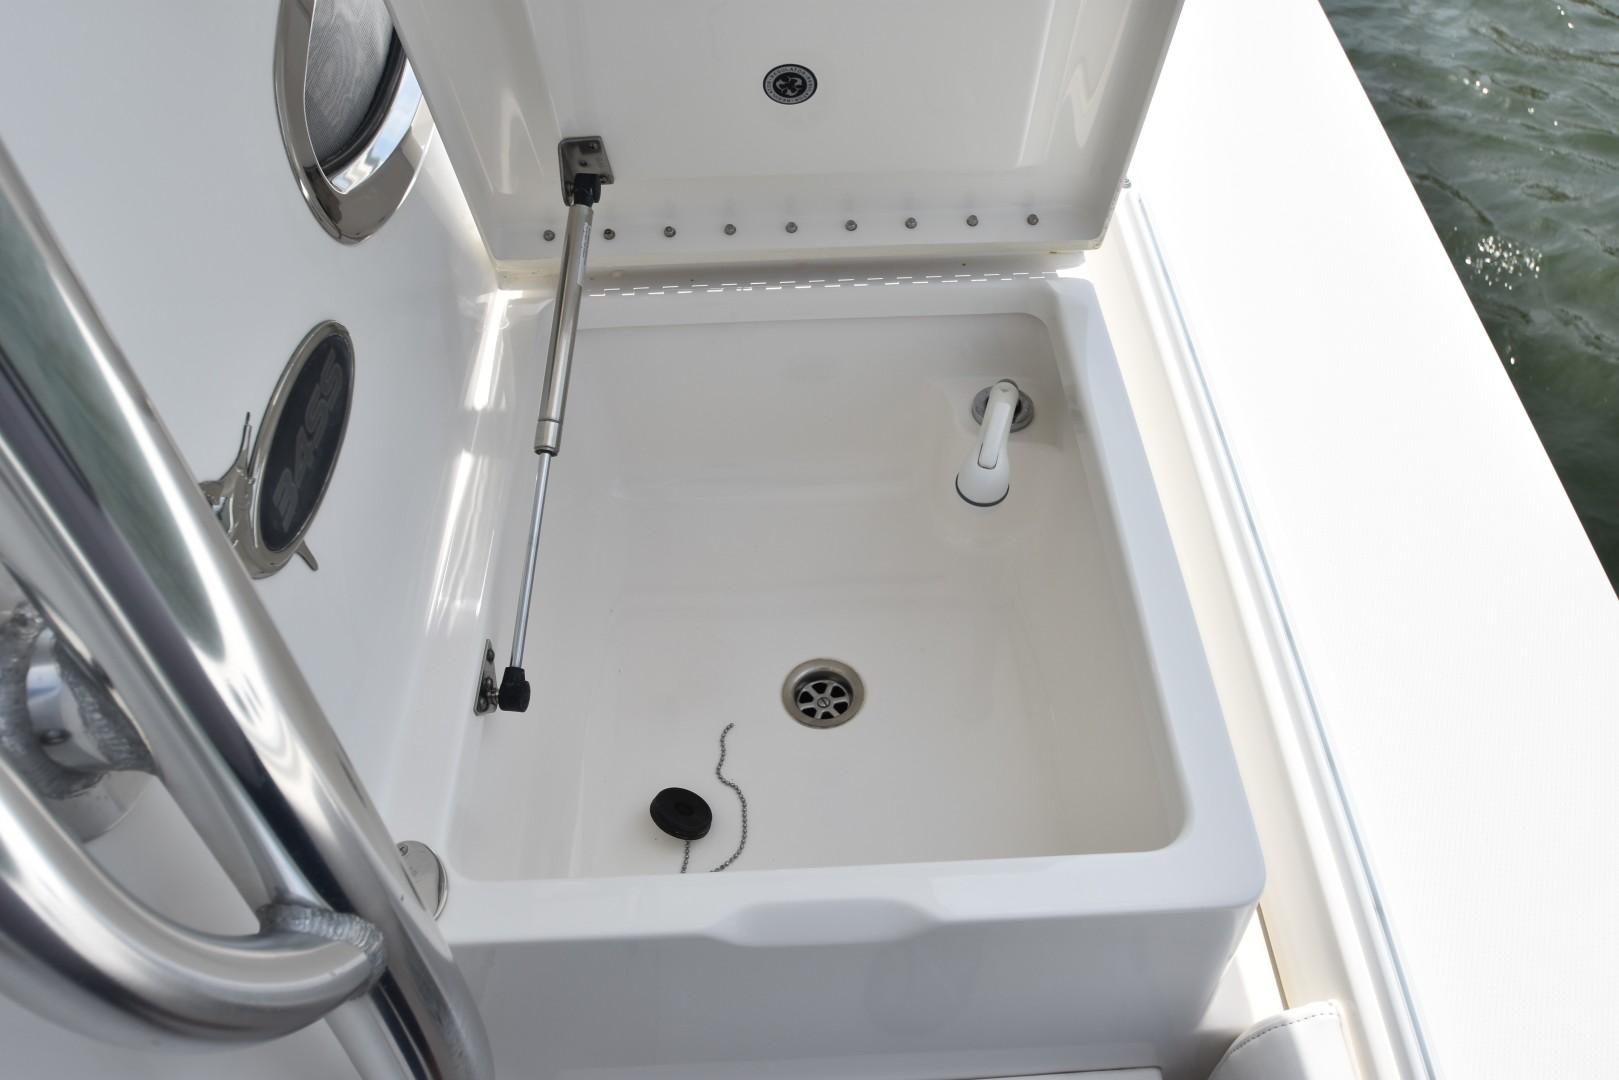 Regulator-34SS Center Console 2012-Reel Dirty Beaufort-North Carolina-United States-1235019 | Thumbnail